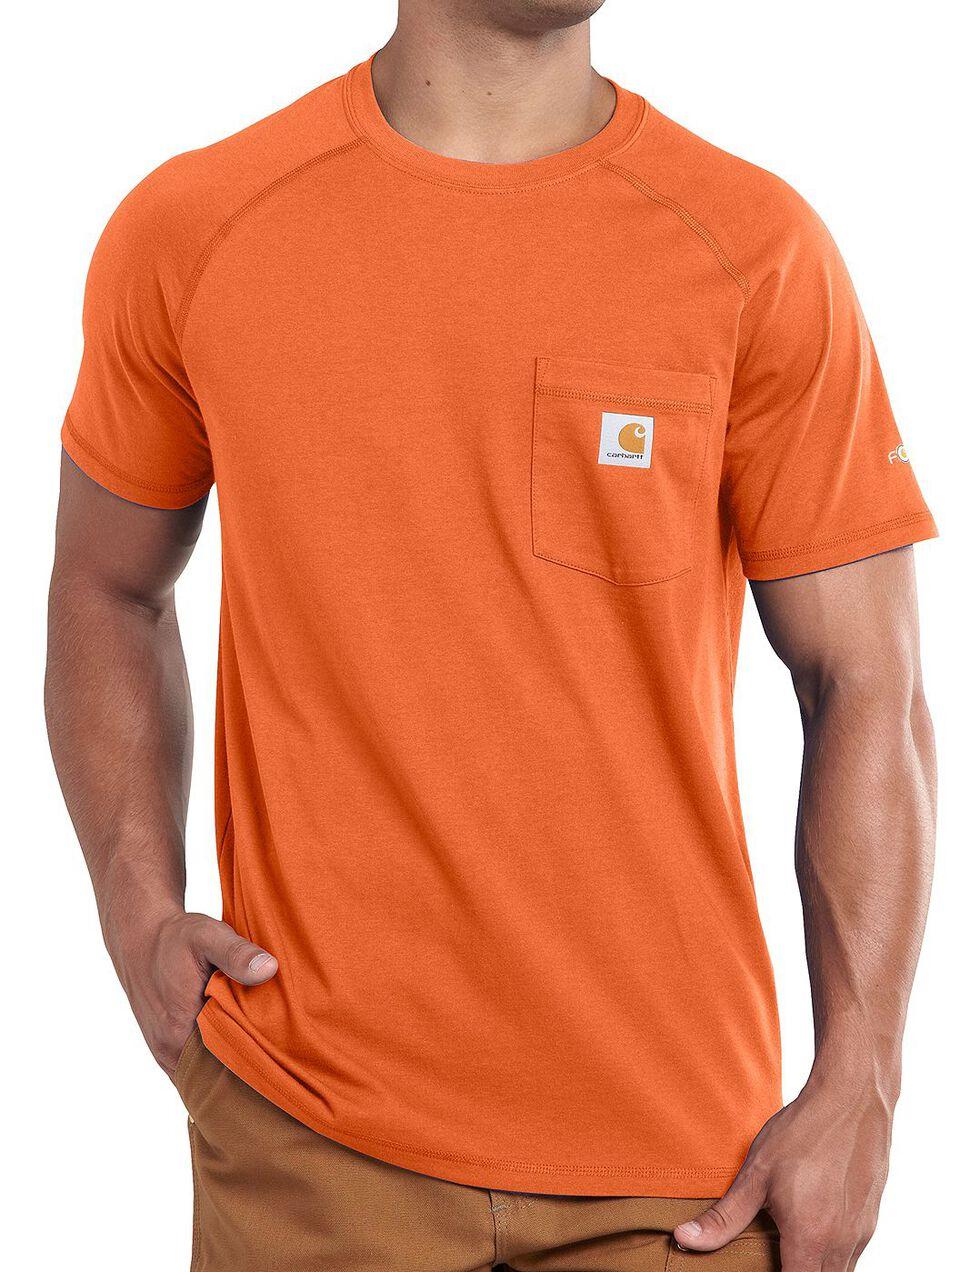 Carhartt Force Cotton Short Sleeve Shirt, Orange, hi-res